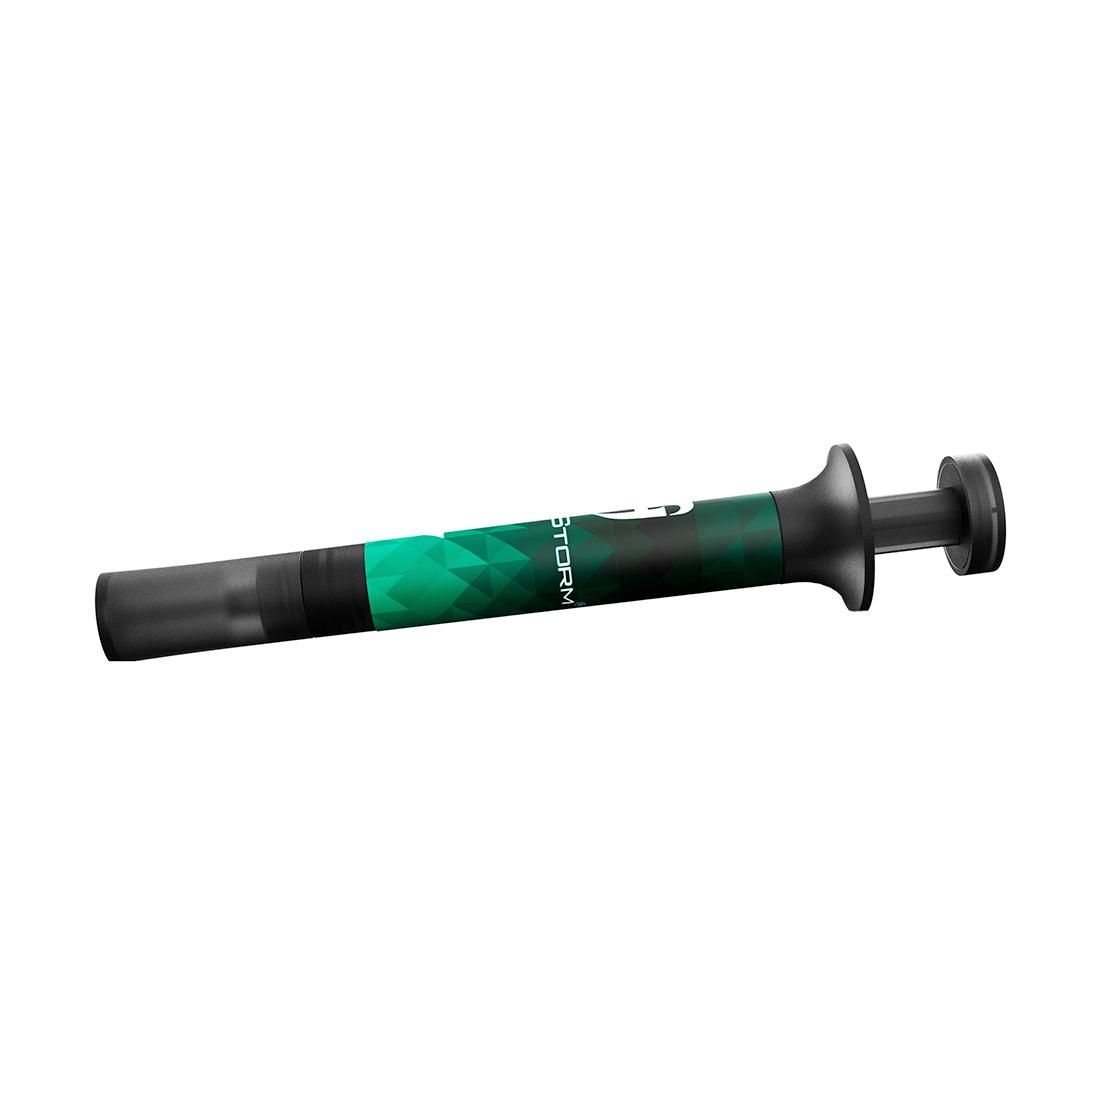 Термопаста Deepcool G40, в шприце, 4 грамм